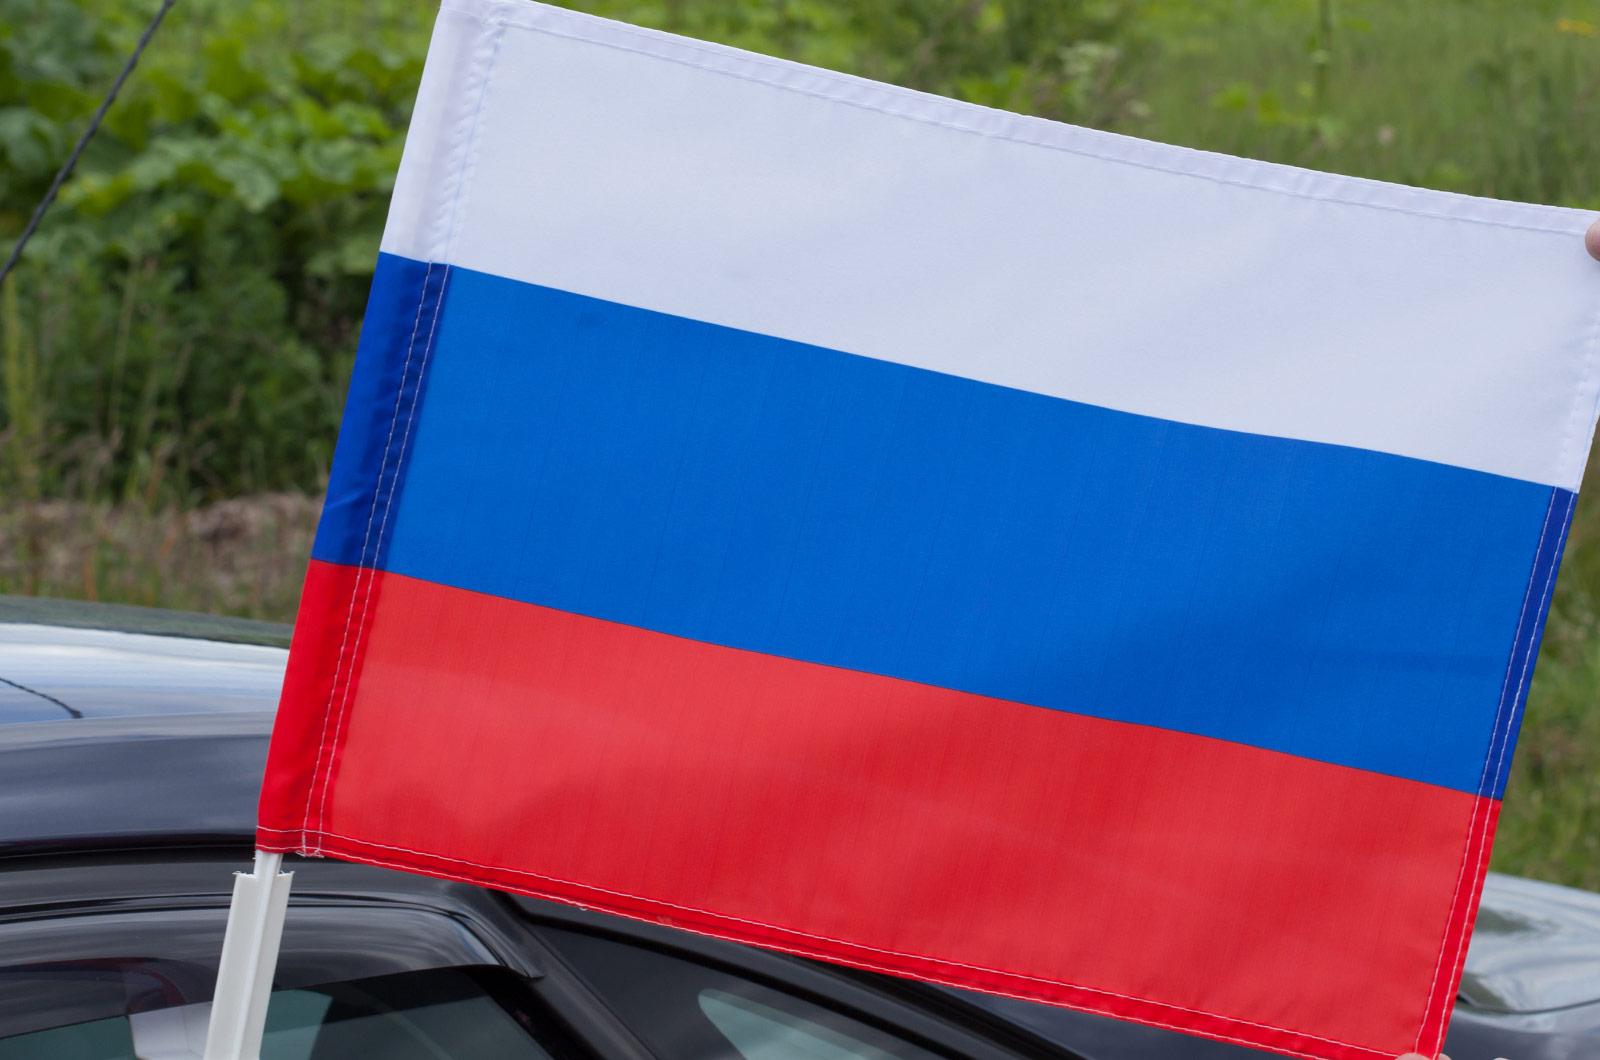 Купить флаг РФ на машину